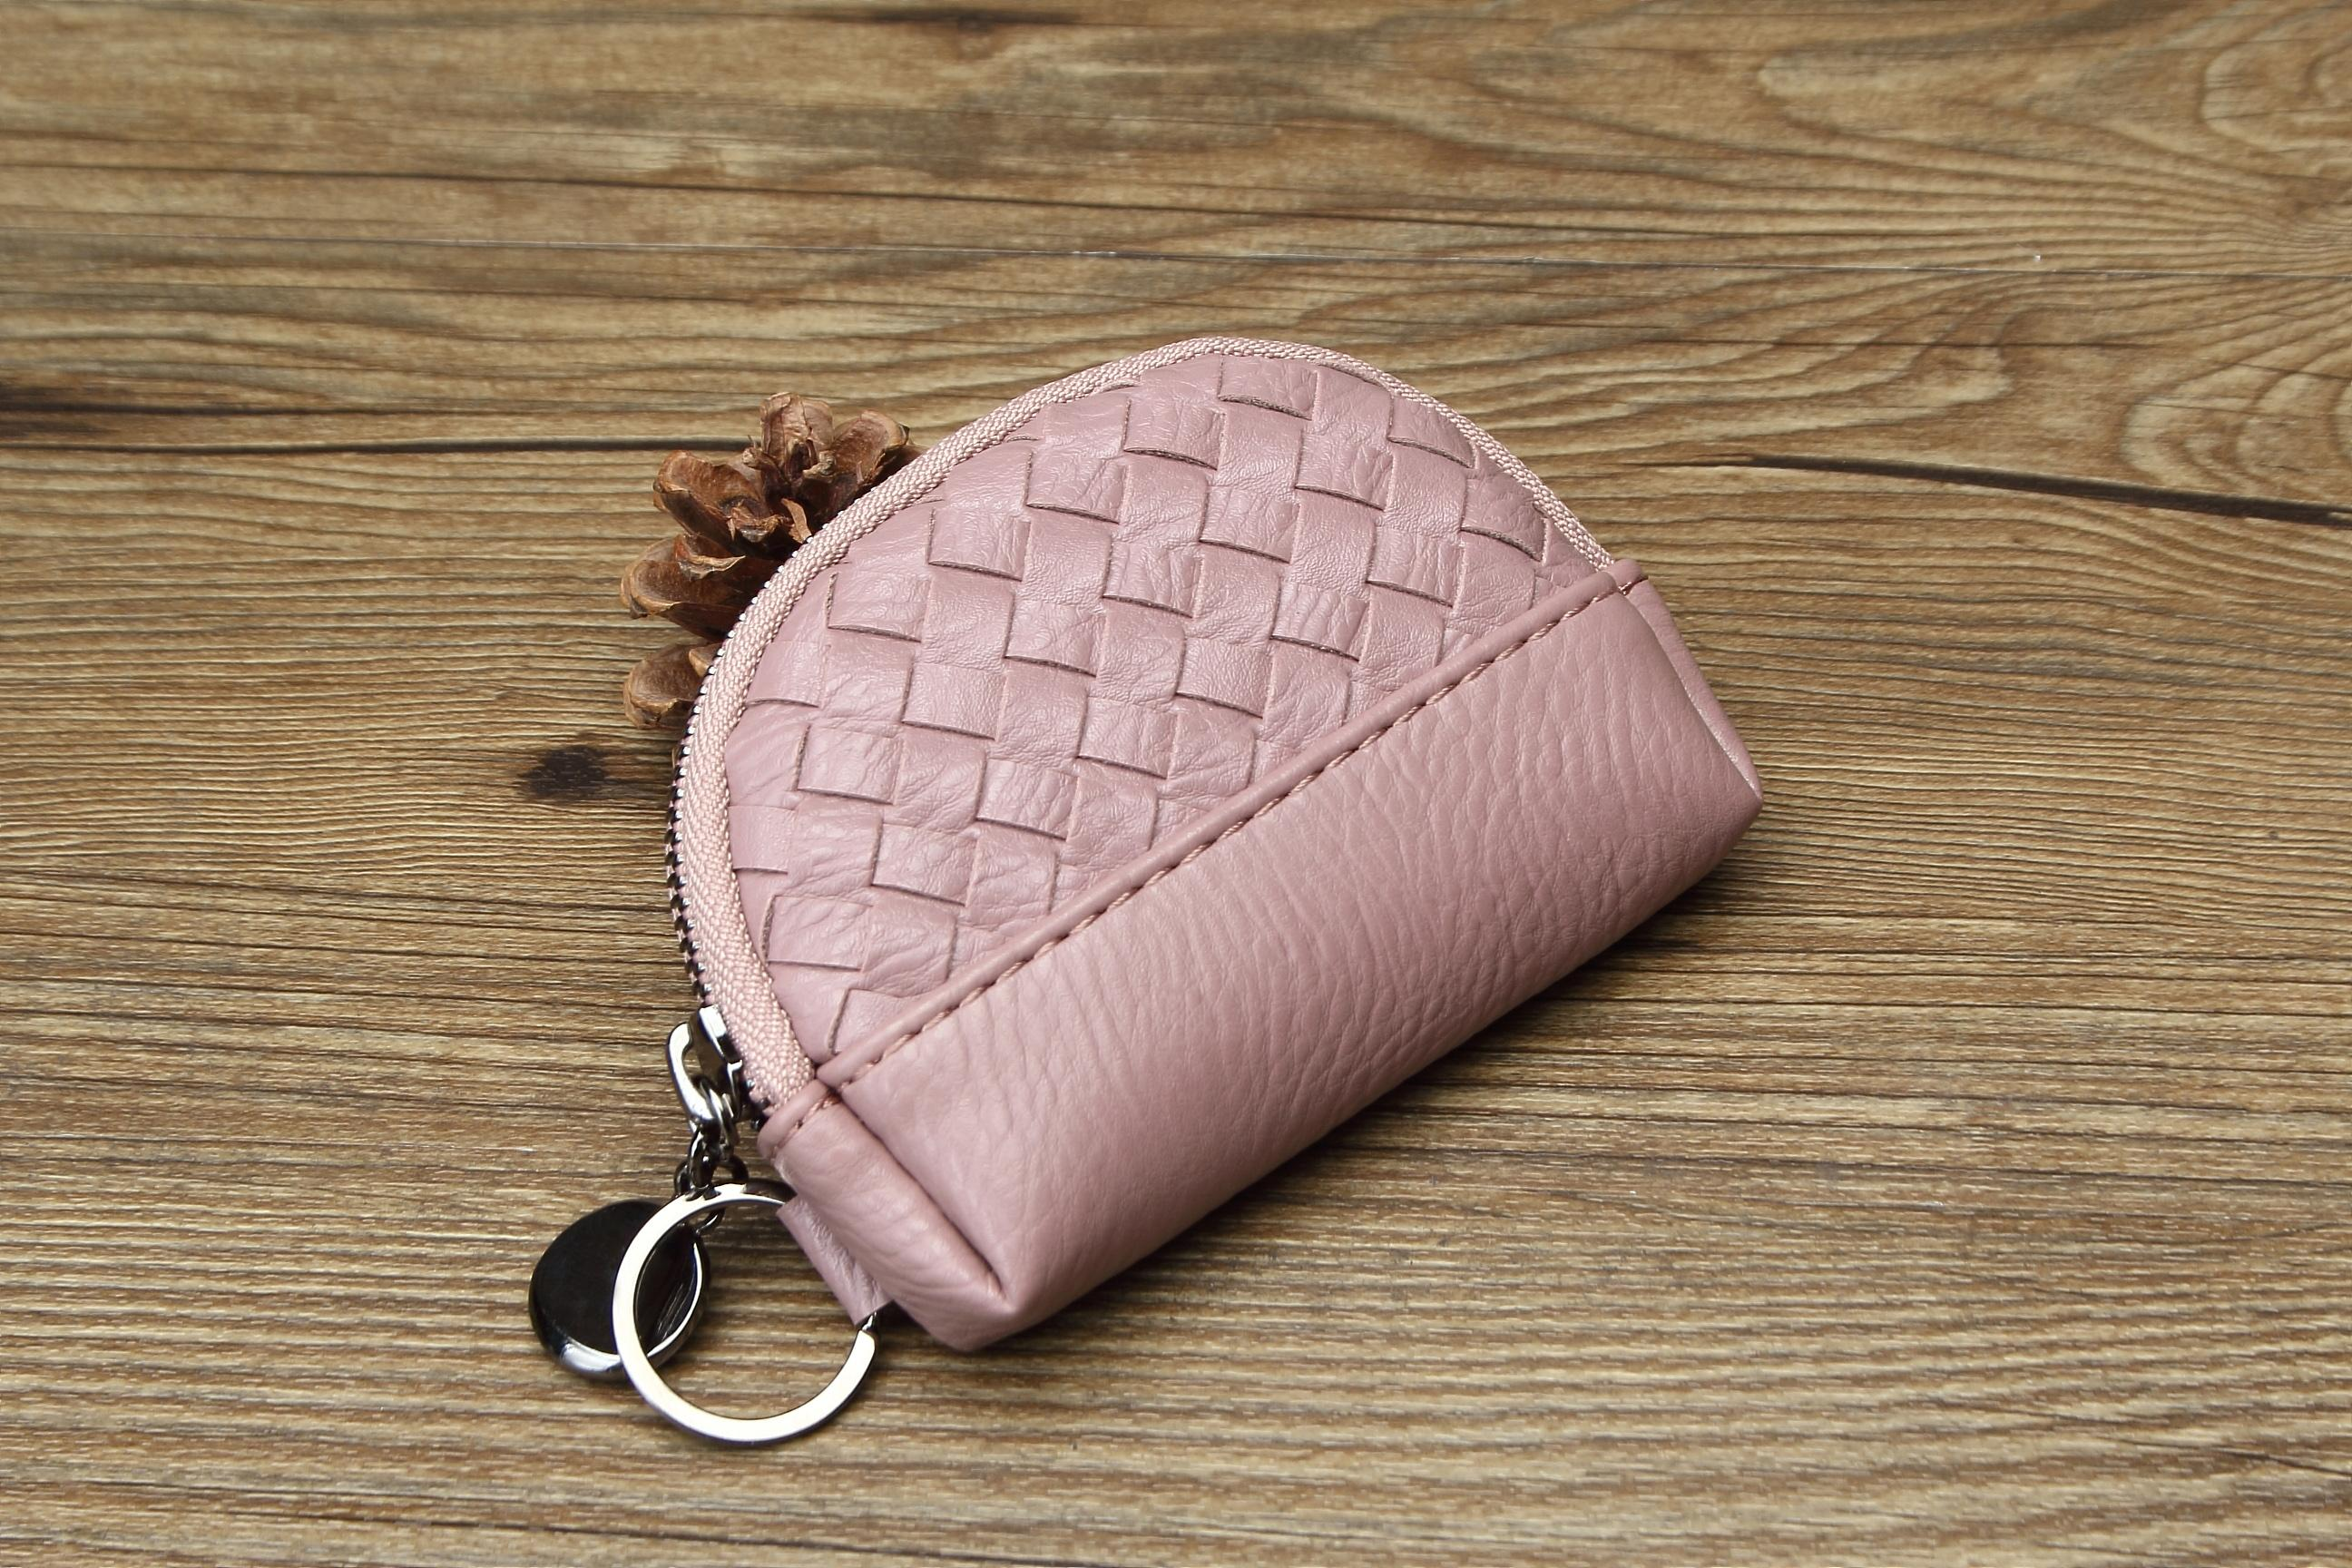 [Koleksi Taobao] Dompet Uang Receh Perempuan 2019 Model Baru Gaya Korea Tas Ponsel Perempuan Mini Hiasan Kerang Tas Tangan Dompet Kecil Dompet Kunci Dompet Koin Wanita